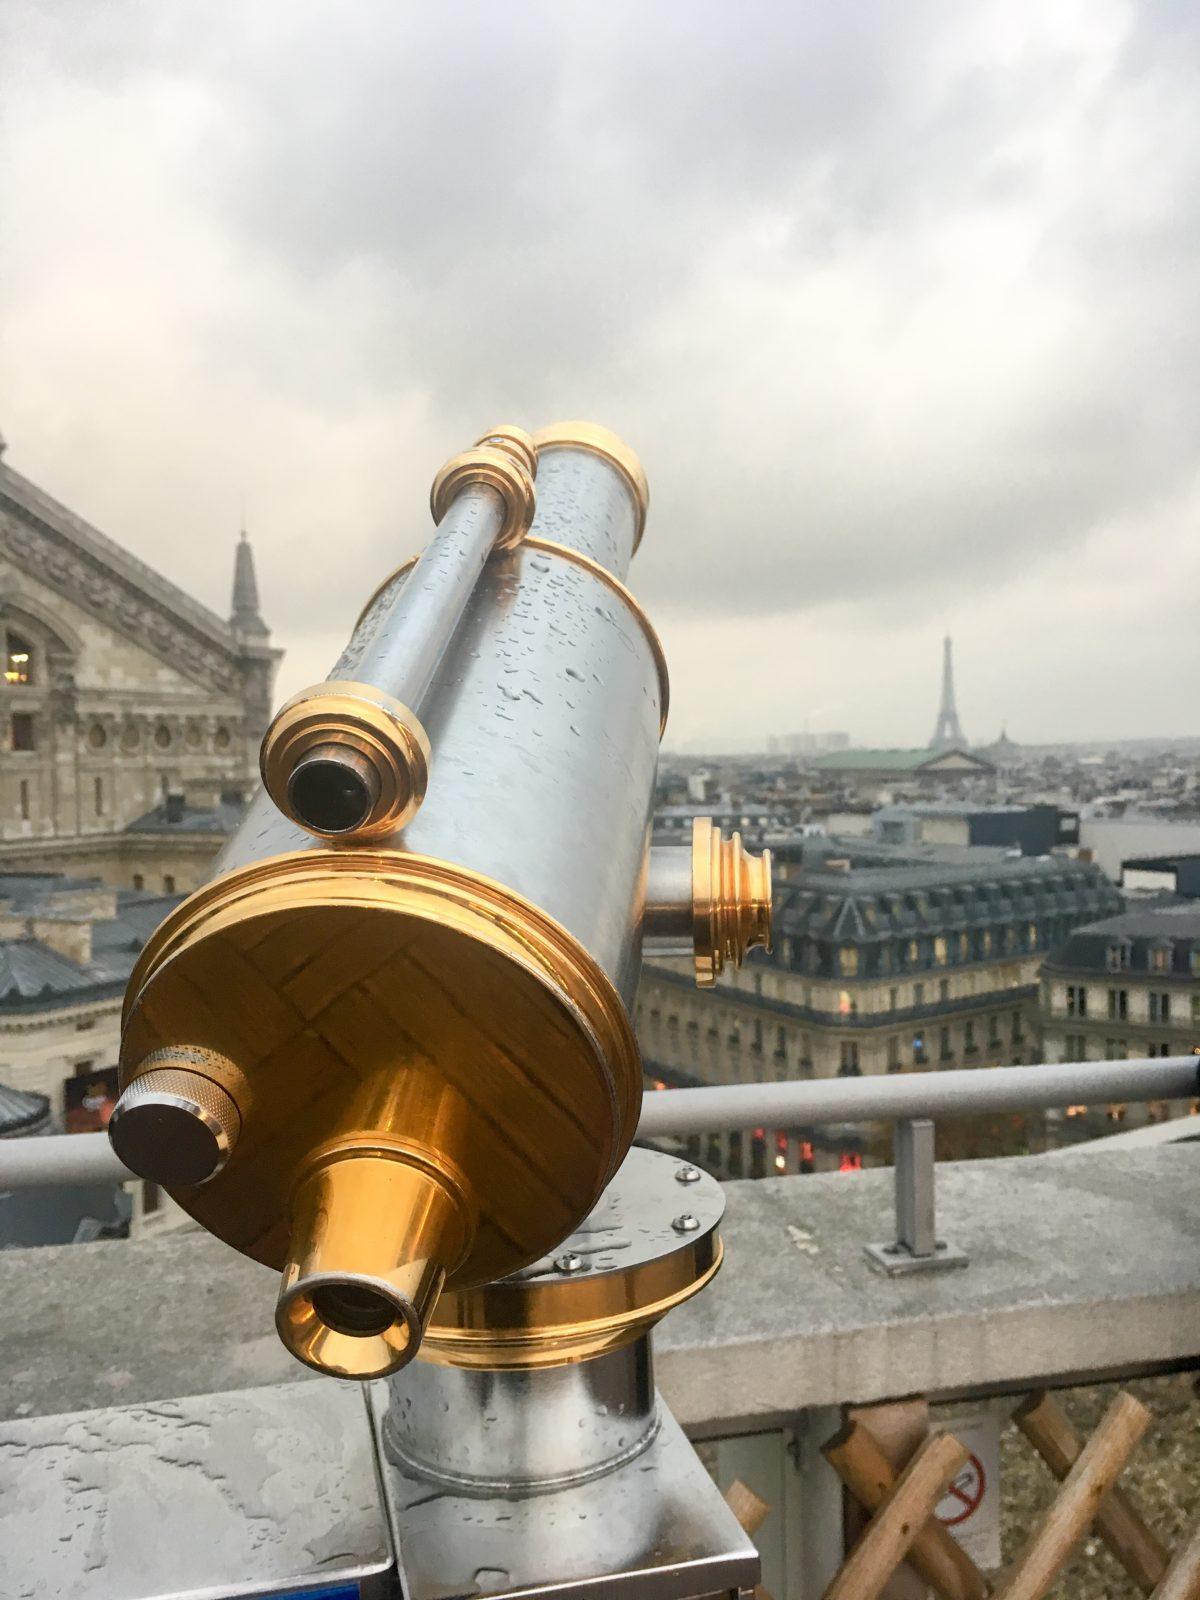 galleries-lafayette-rooftop-paris-eiffel-tower